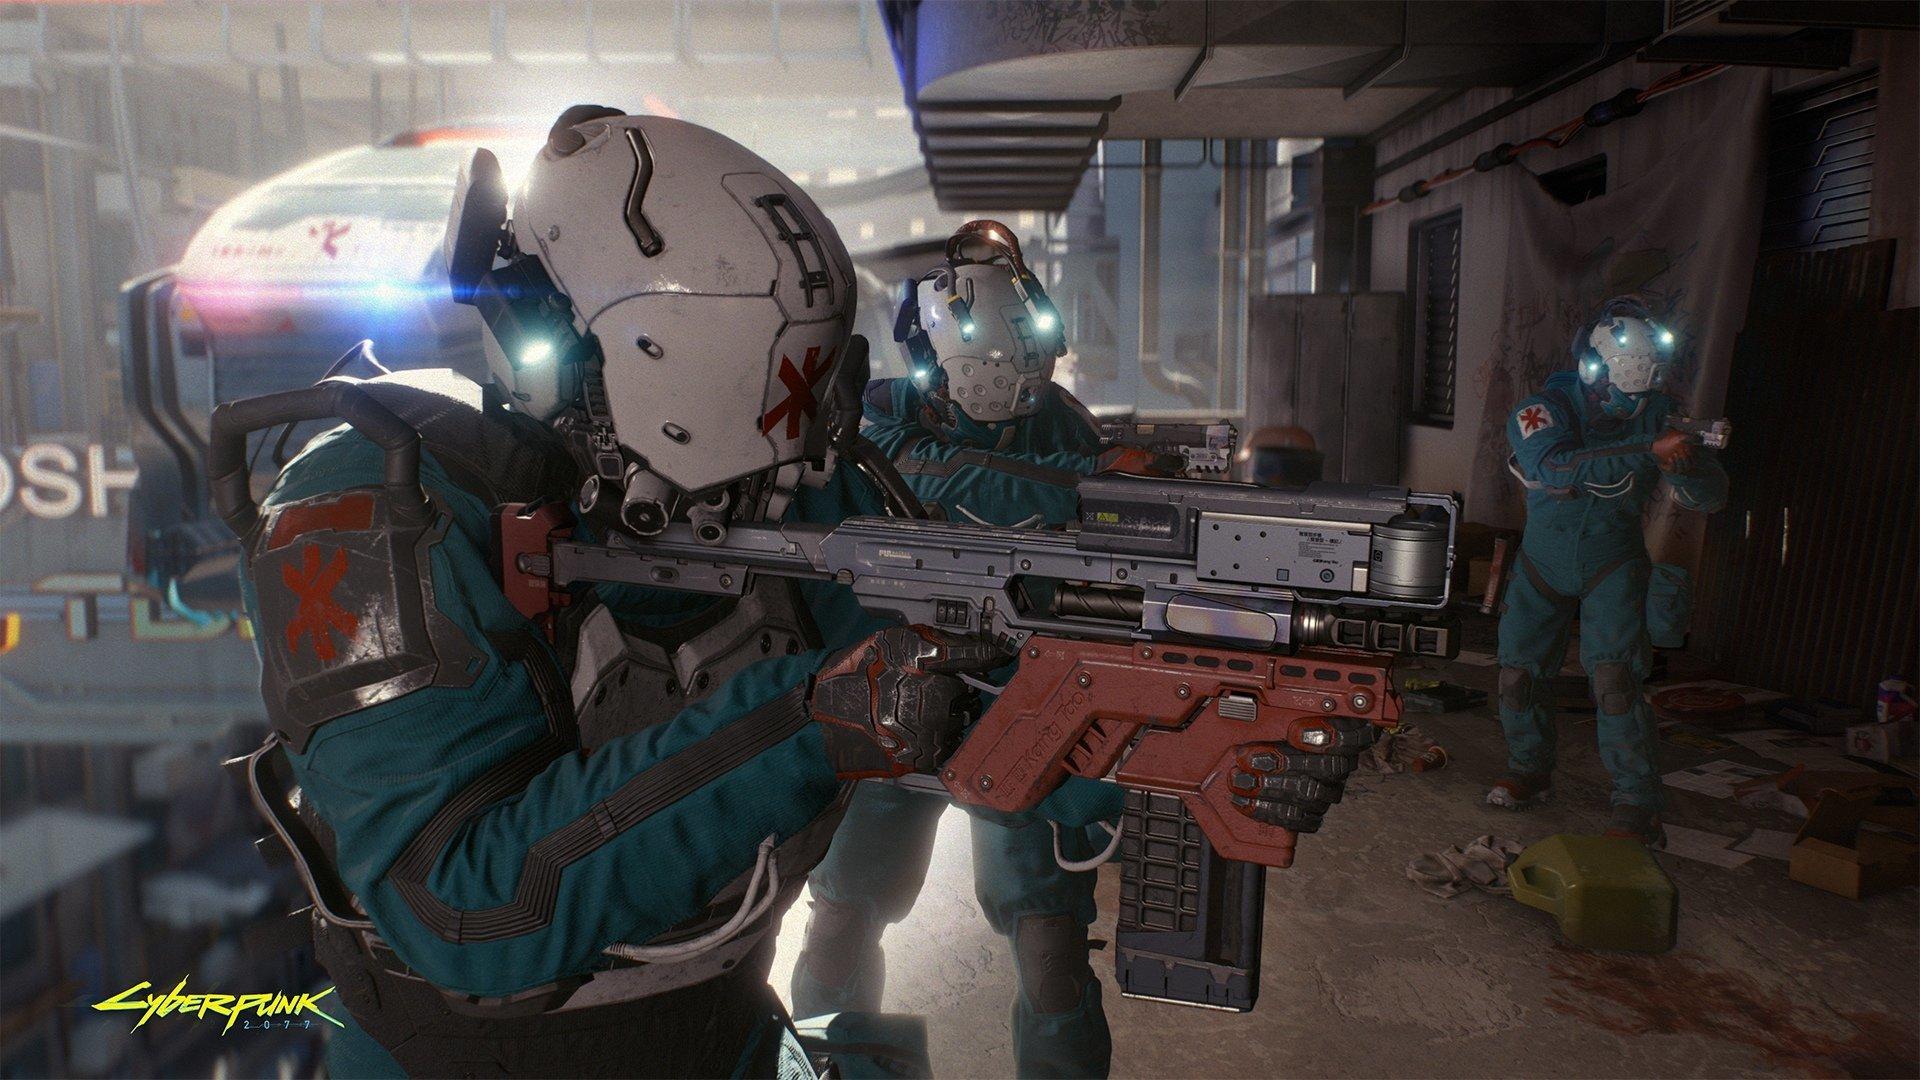 Sony убрала Cyberpunk 2077 из онлайн-магазина. Компания возвращает деньги за игру